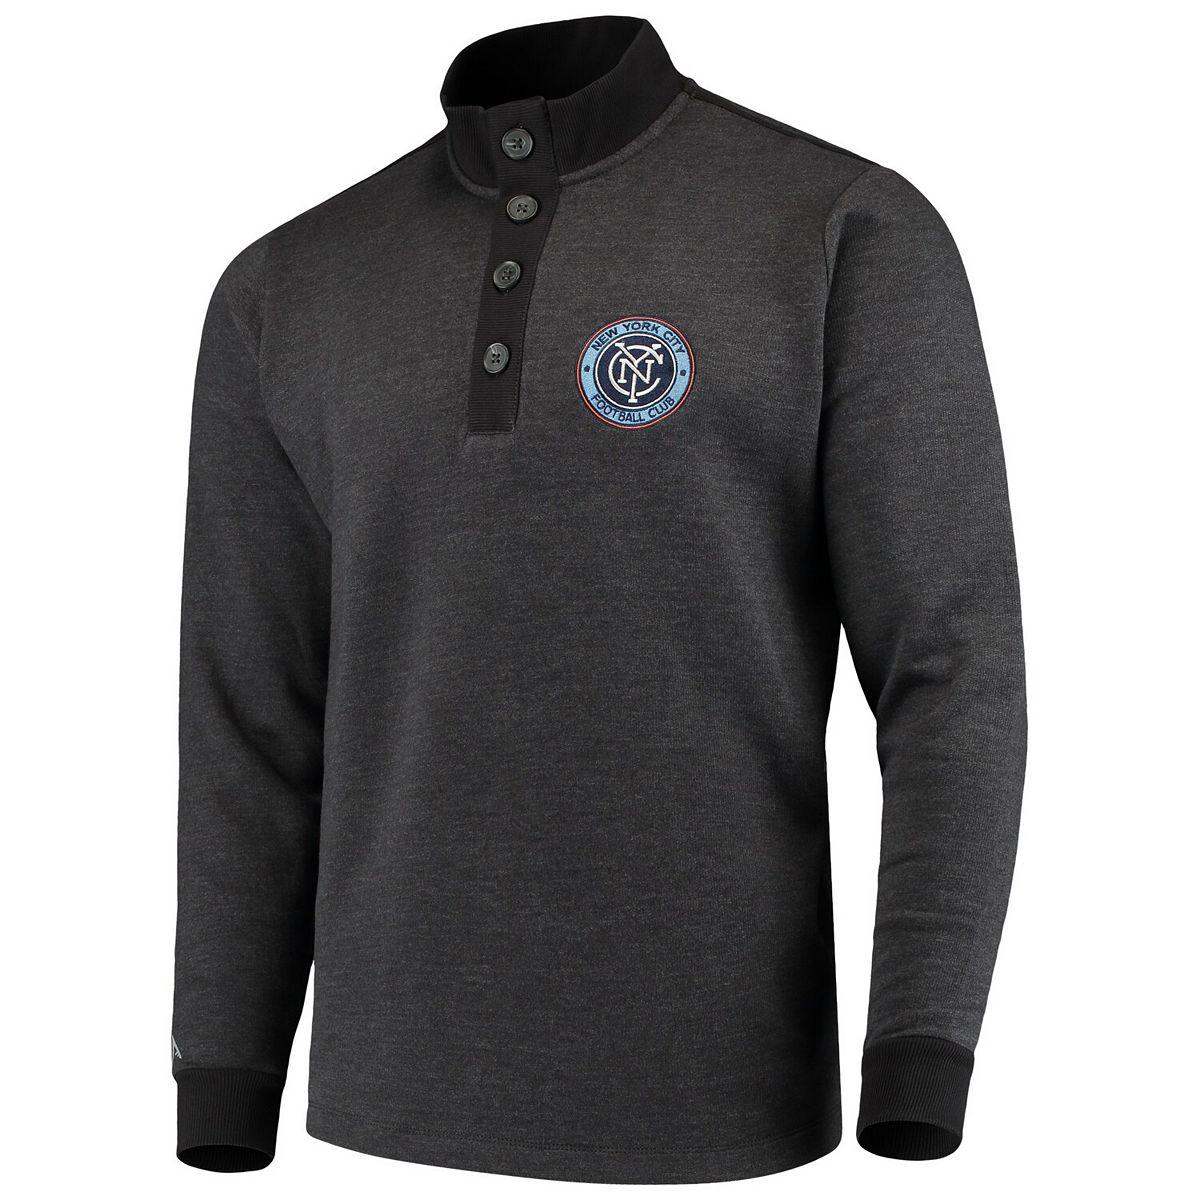 Men's Antigua Black New York City FC Pivotal Fleece Pullover Sweatshirt W7kQr